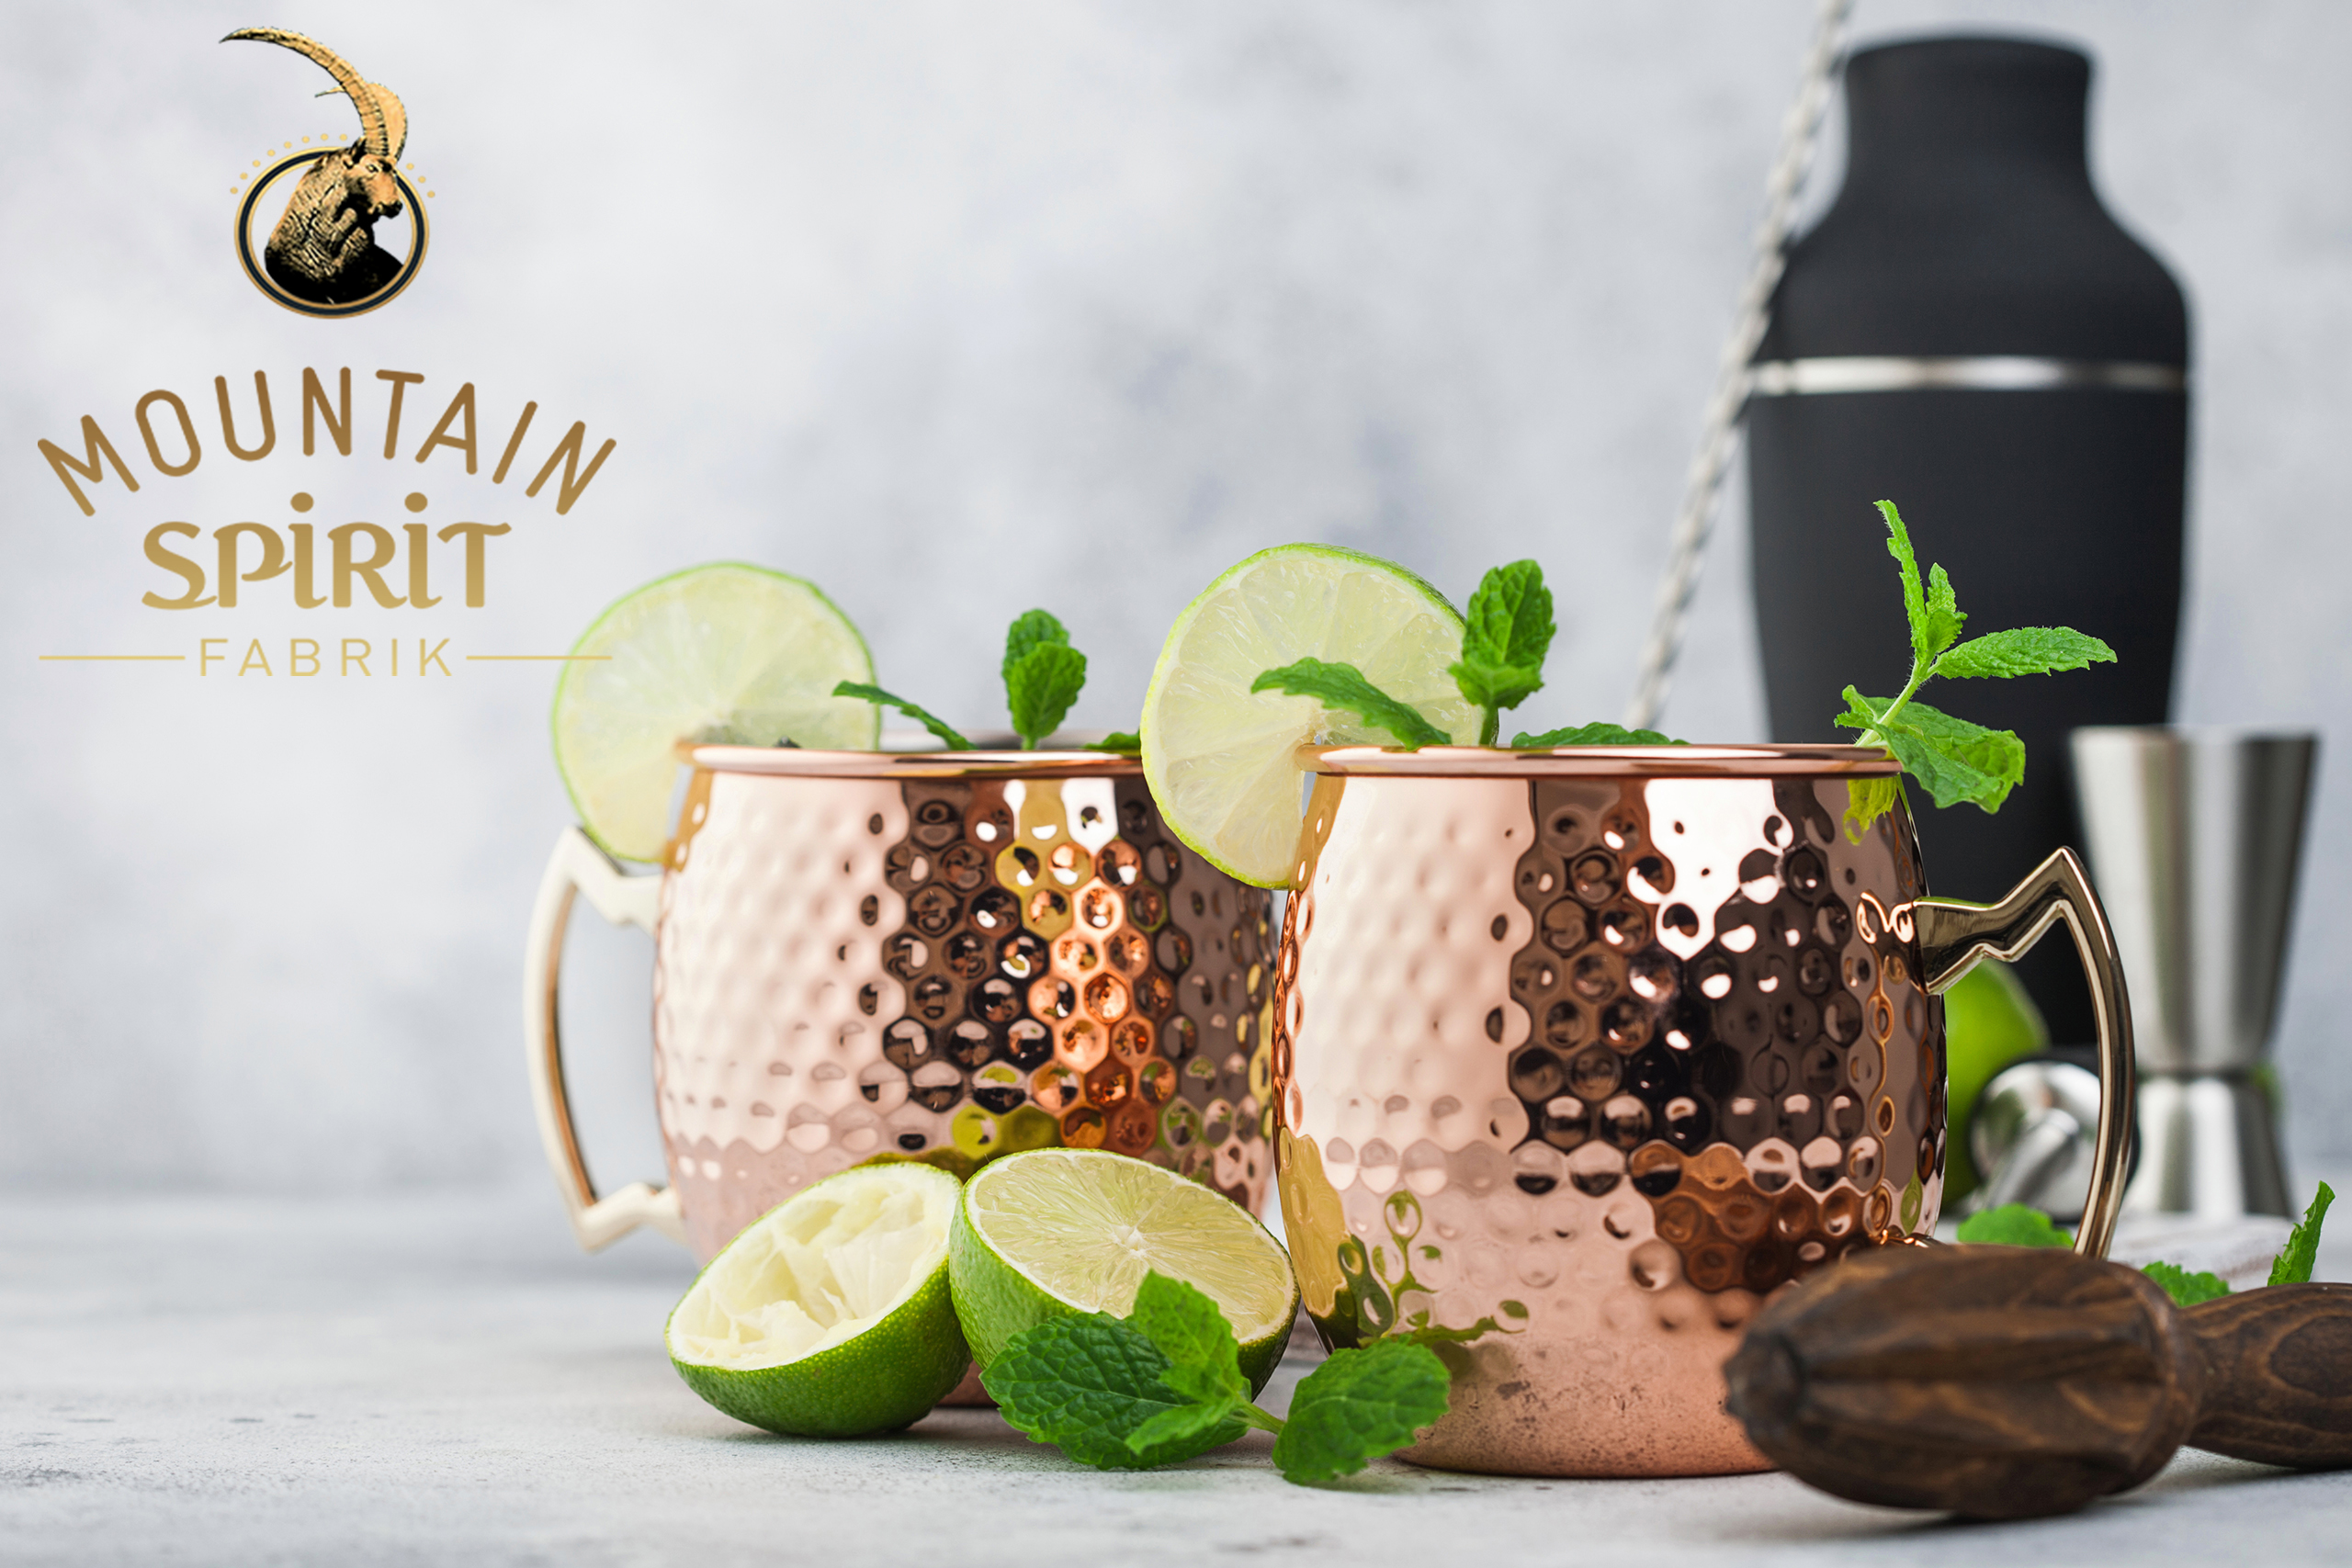 cocktail genepi mule de mountain spirit fabrik